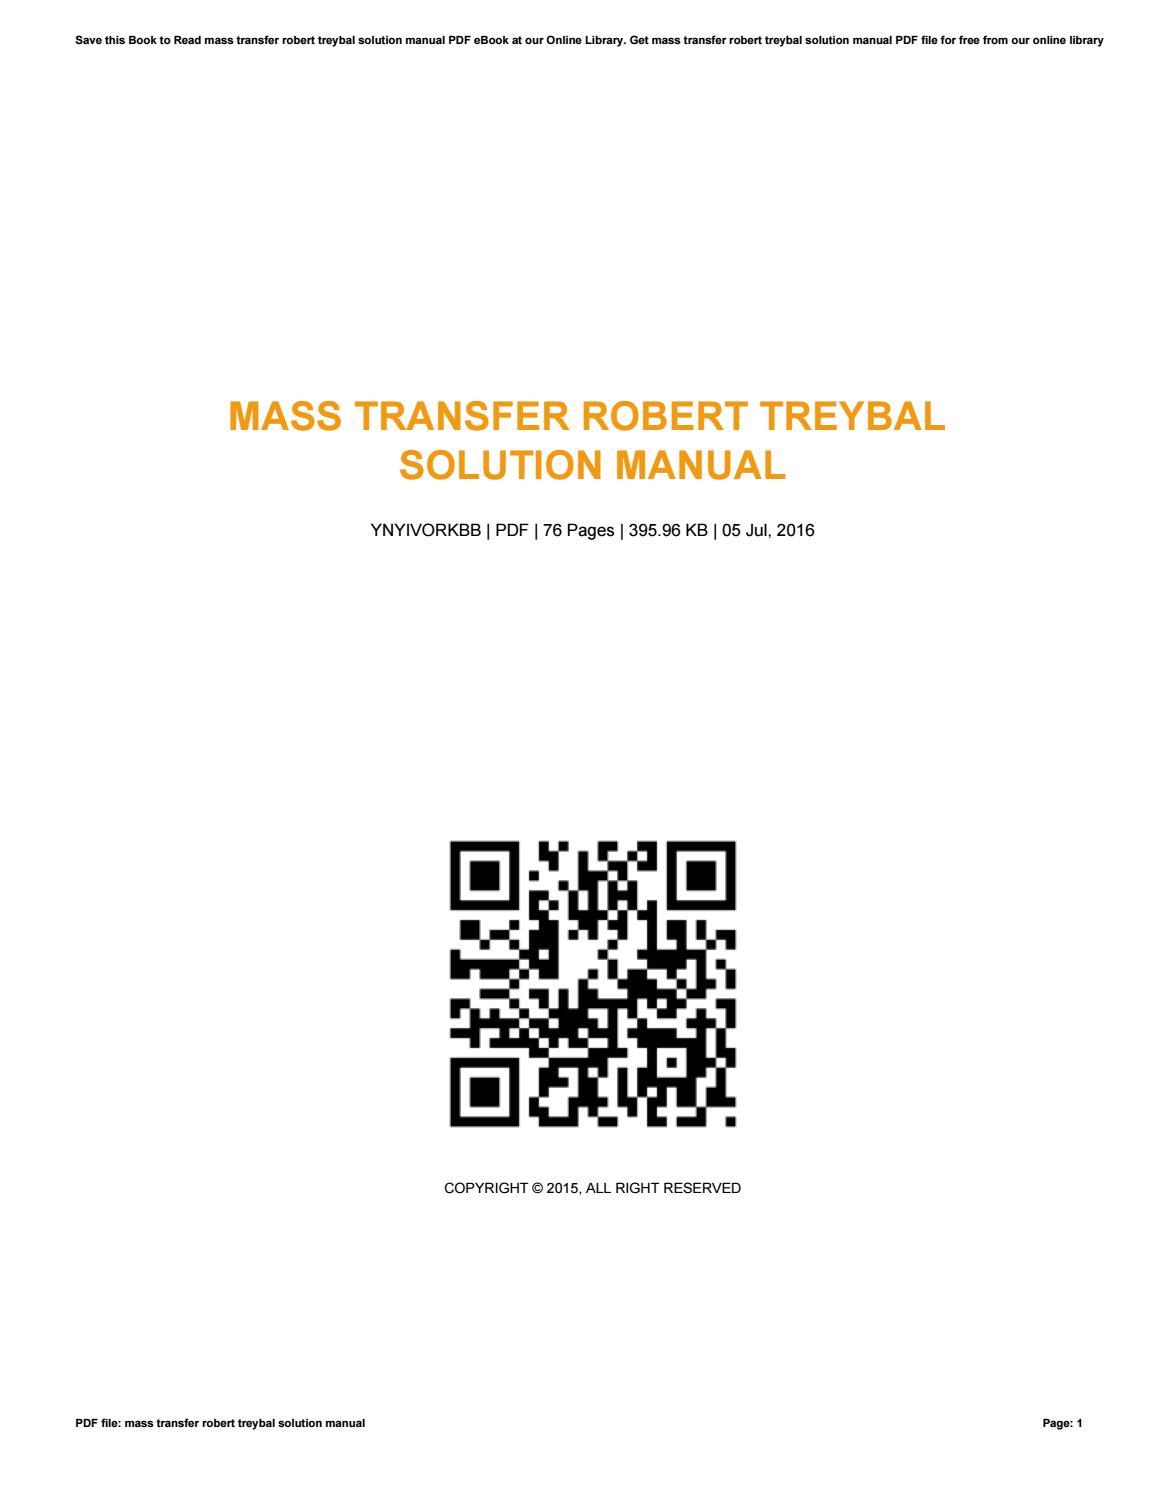 Mass transfer robert treybal solution manual by